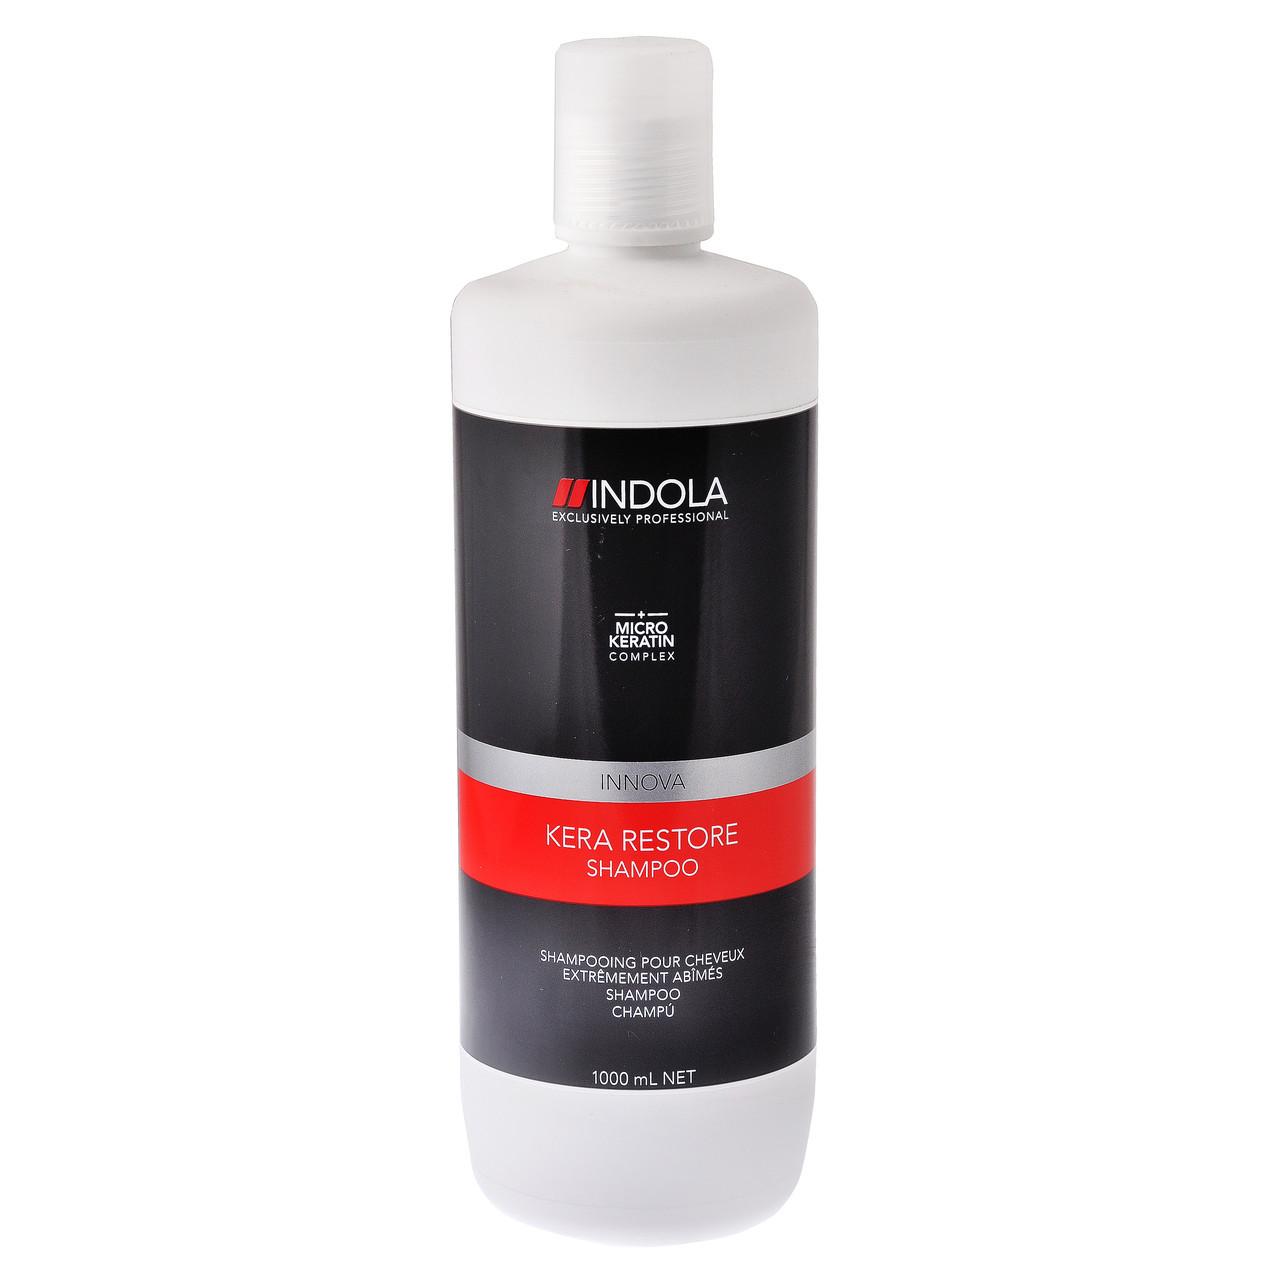 Восстанавливающий шампунь Indola Innova Kera Restore Shampoo, 1000 мл